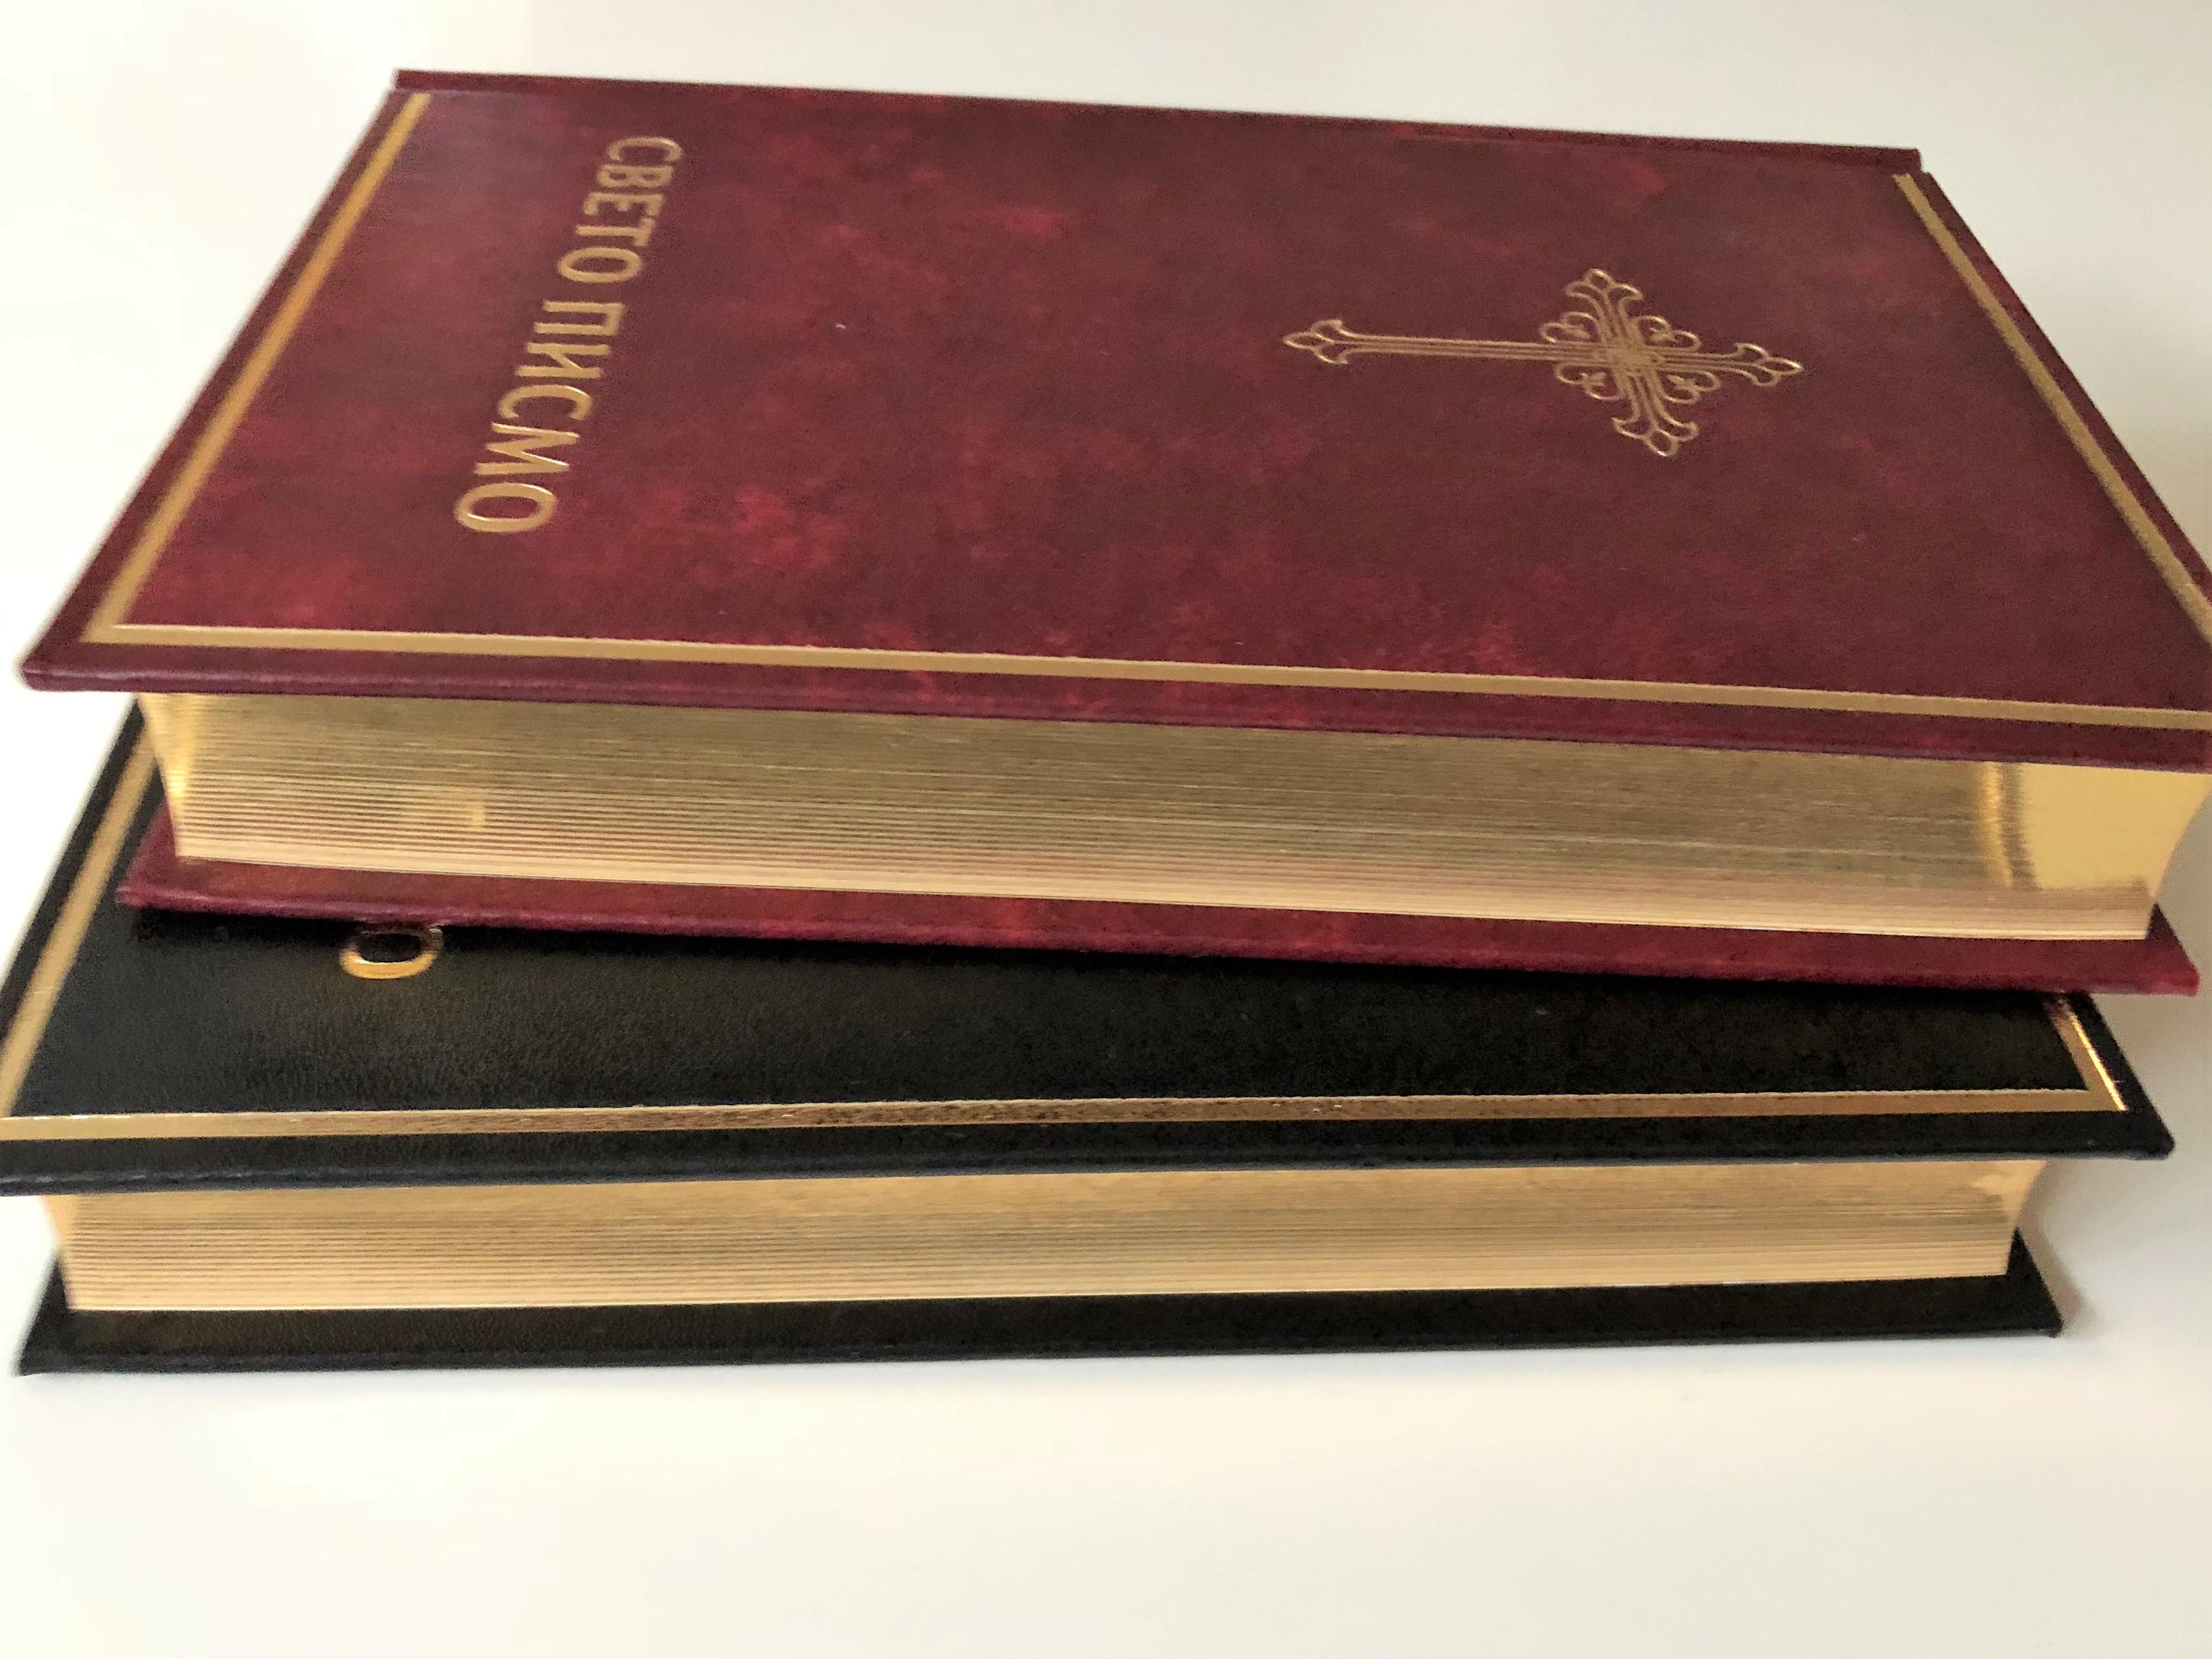 serbian-language-bible-burgundy-cover-with-golden-cross-cyrillic-script-043hs-3-.jpg